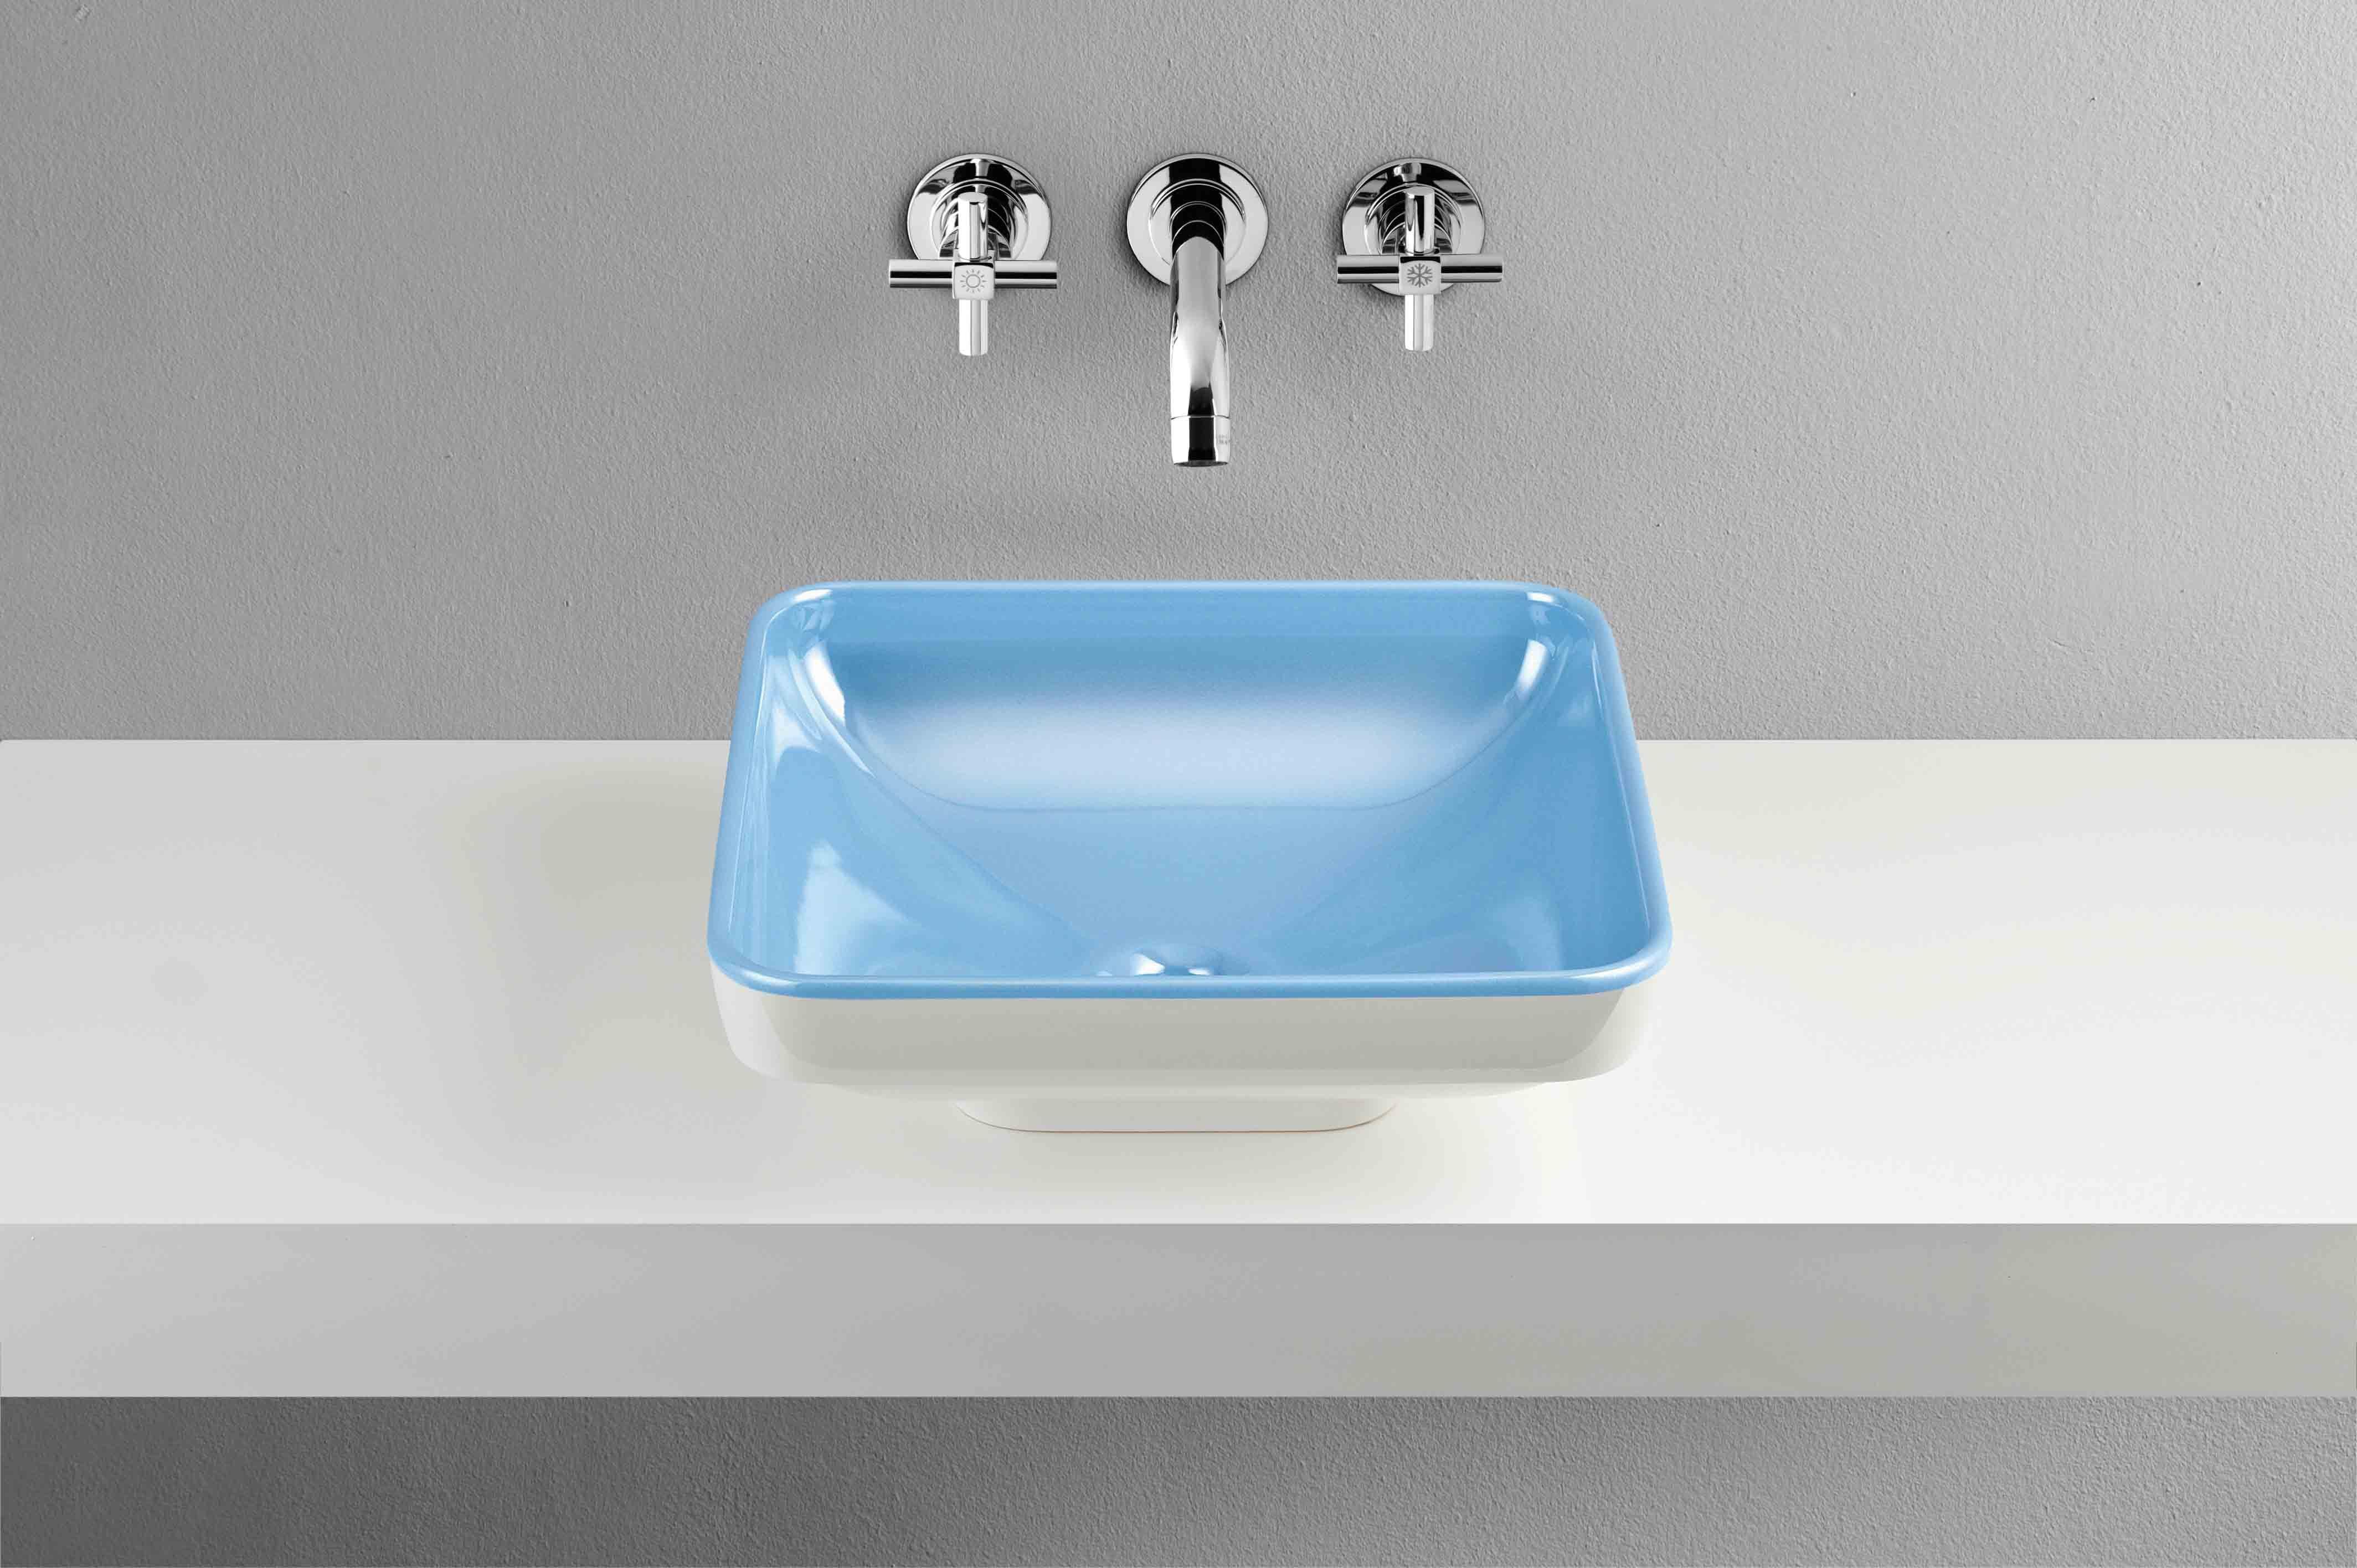 Square Water Jewels Basin Designed By Matteo Thun For VitrA VitrA  Www.vitra.co Idea